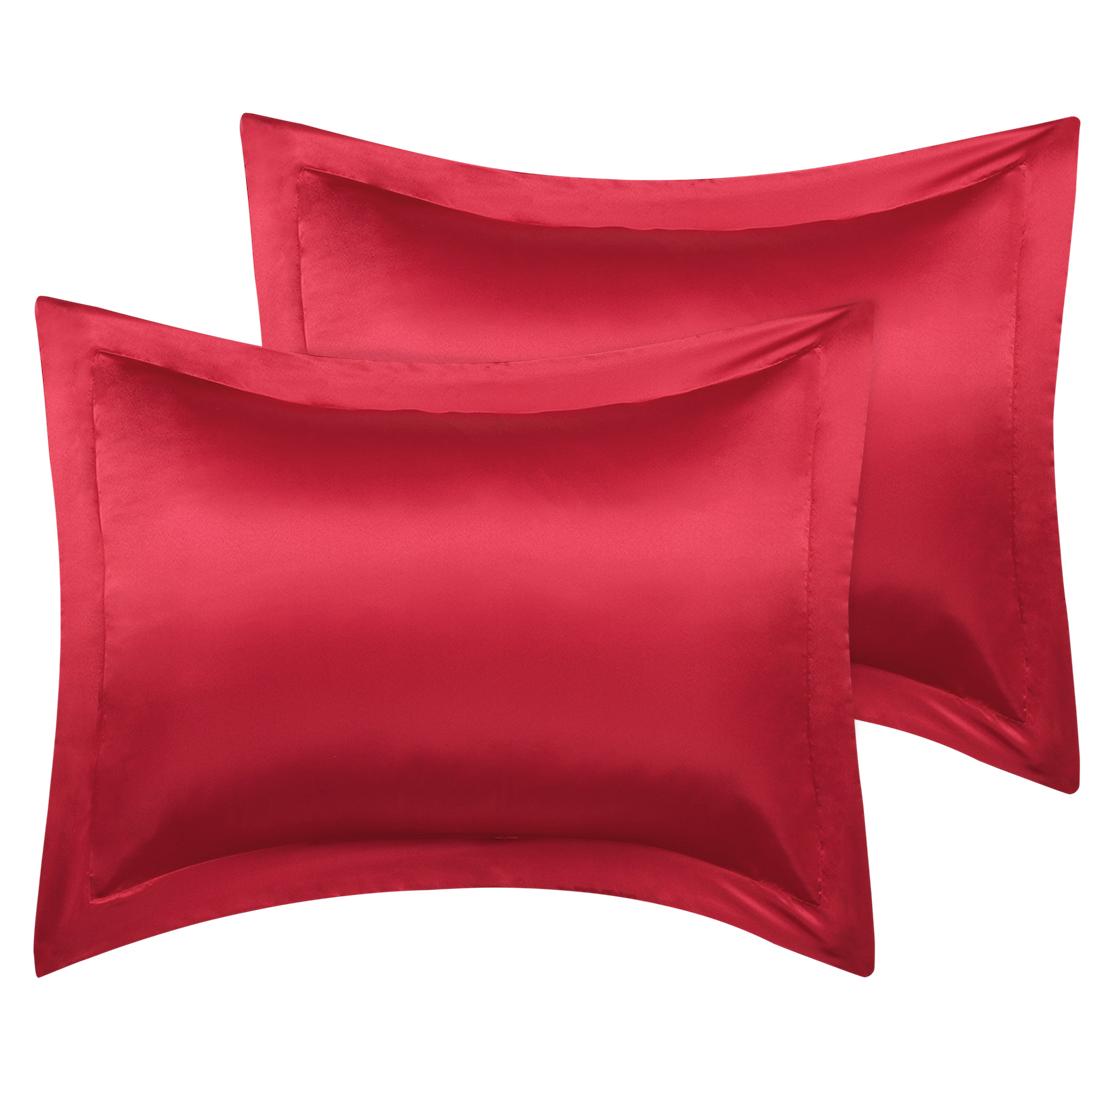 2 Pcs Wine Red Pillow Shams Satin Pillow Cases Standard Oxford Pillowcases